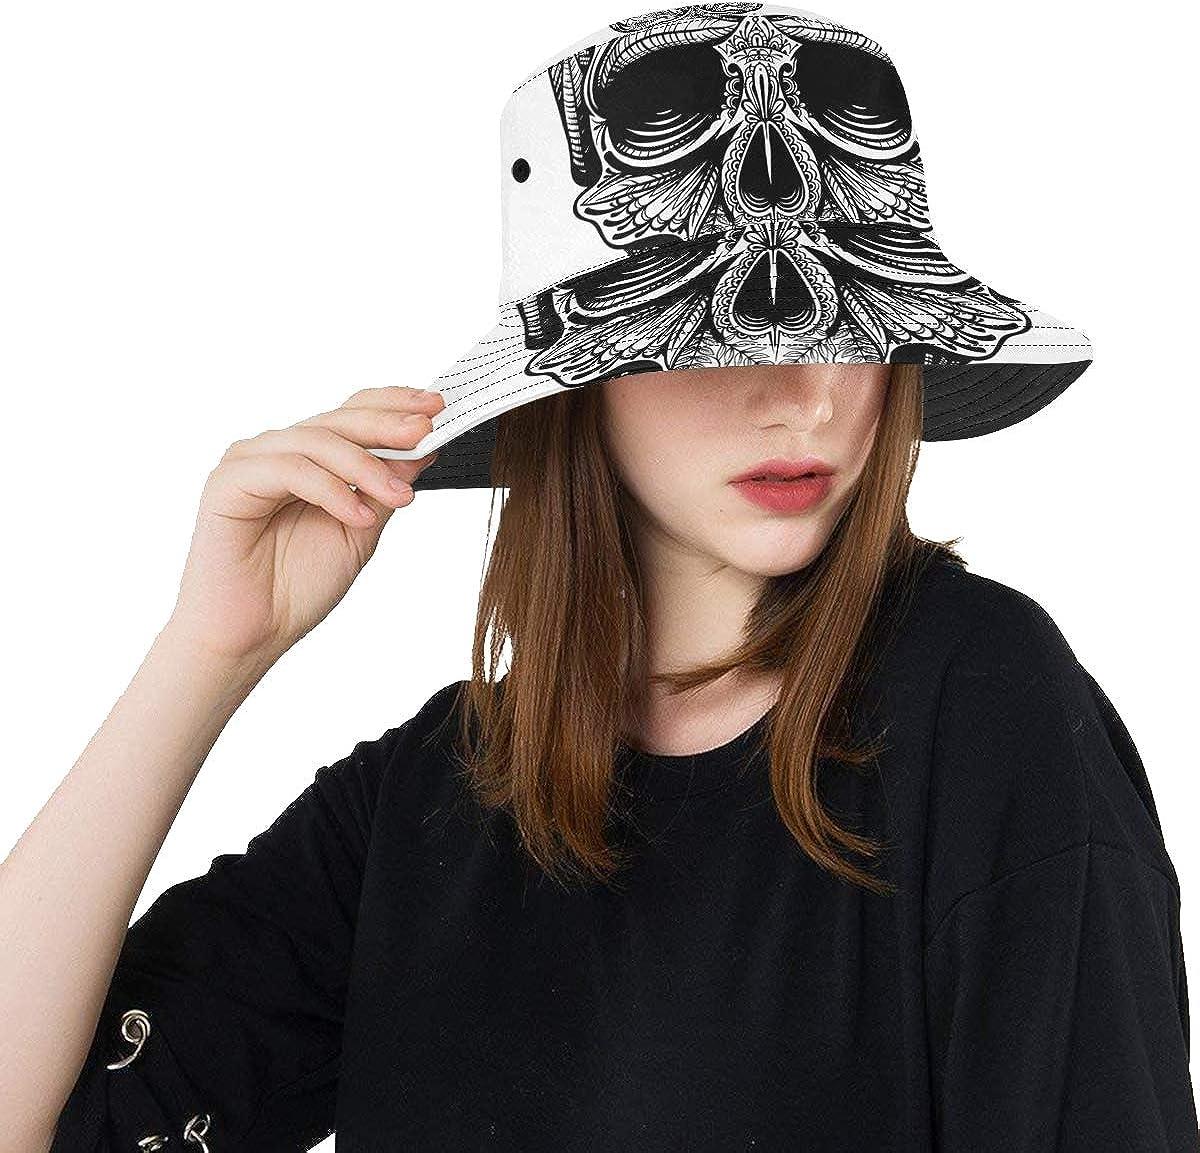 Limited price sale Hat Beach Women Skull Cool Bone Tattoo Scary Summer Fishi Unisex Fees free!!